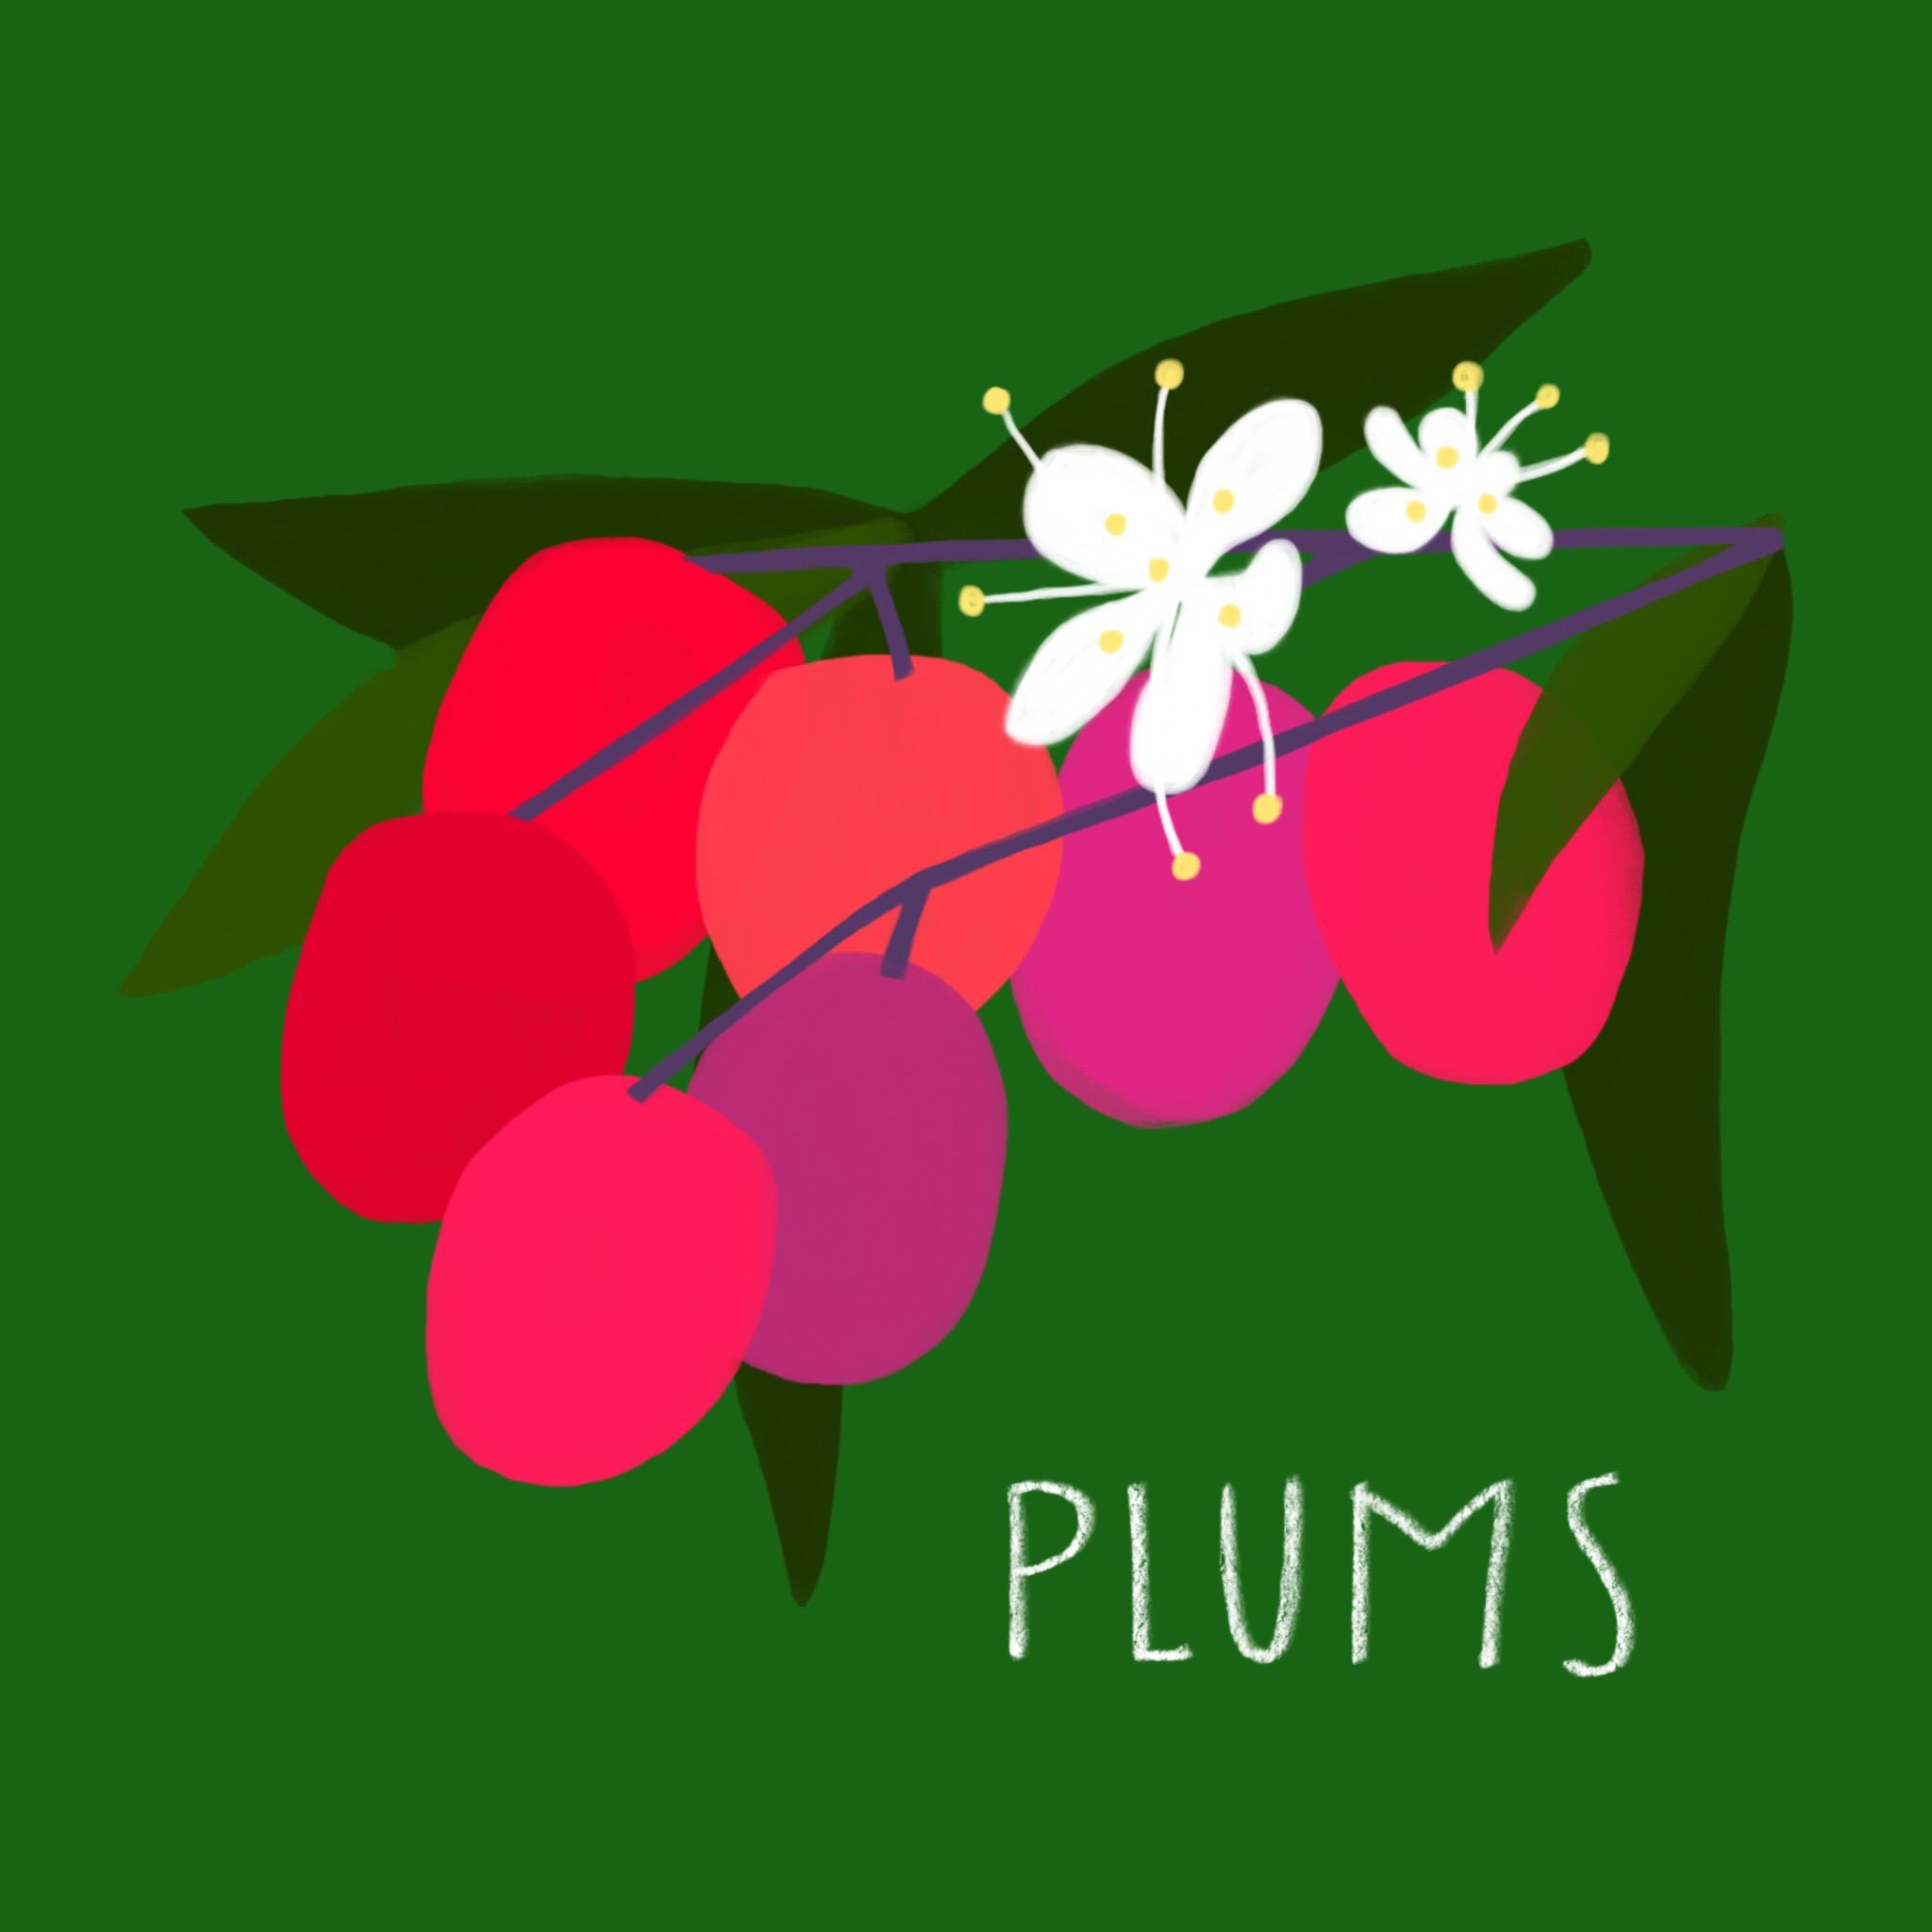 39_-_Plums.jpg